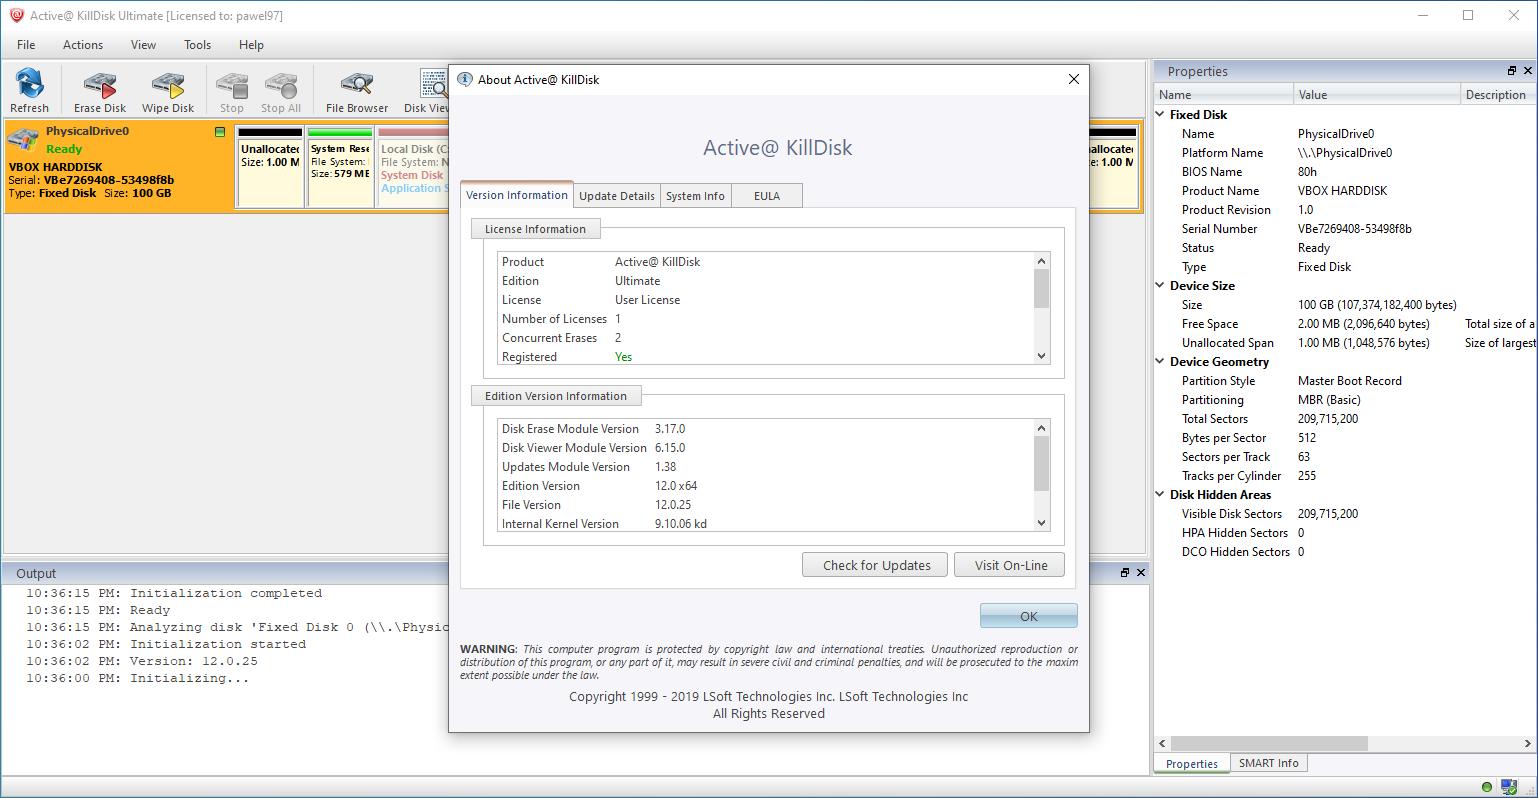 activekilldisk12.0.25.2